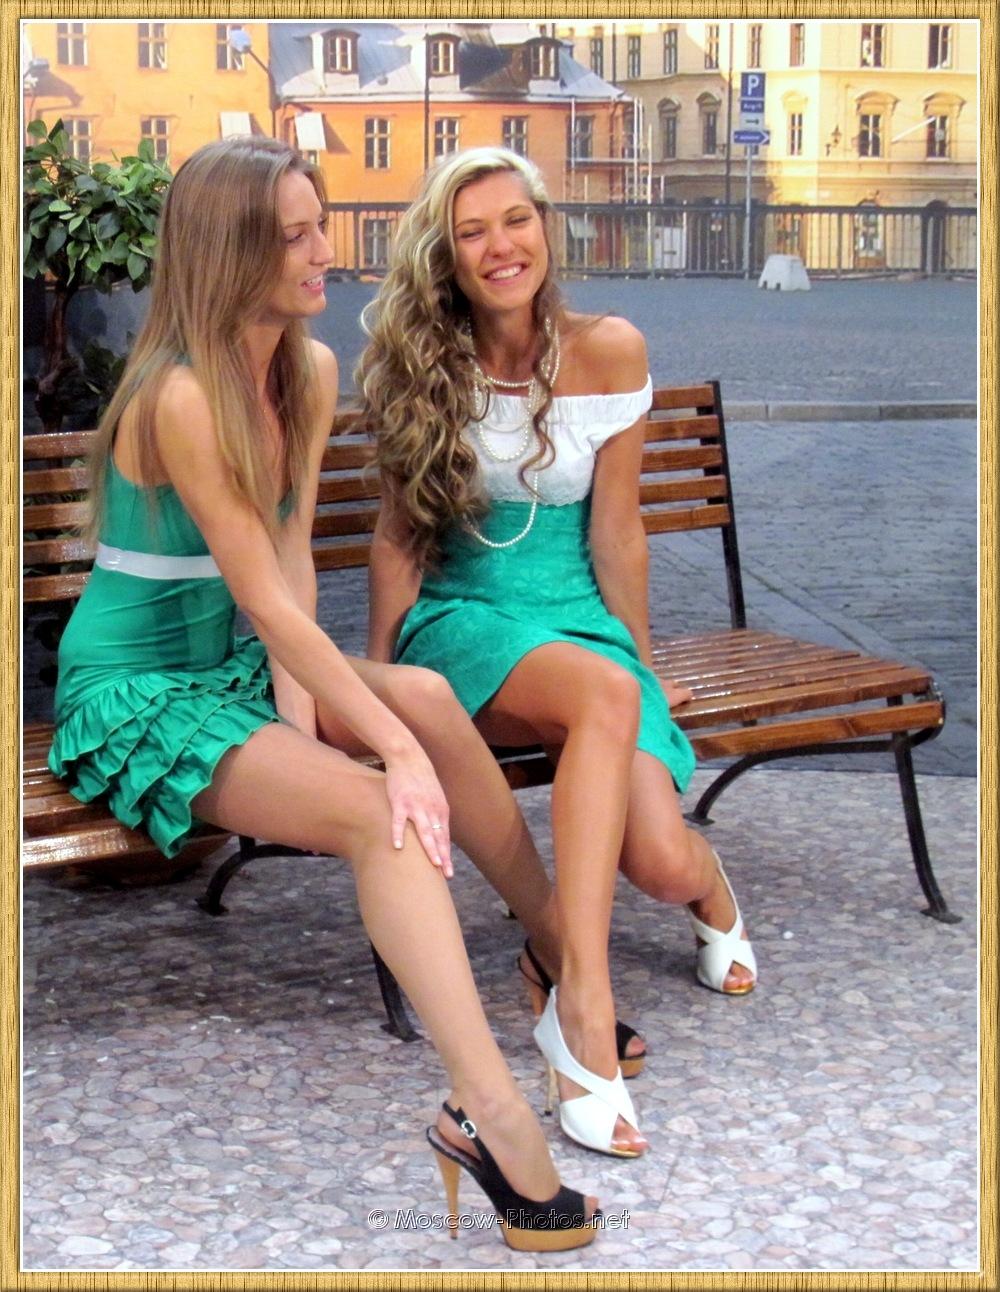 Smiling Long Legs Models at Photoforum